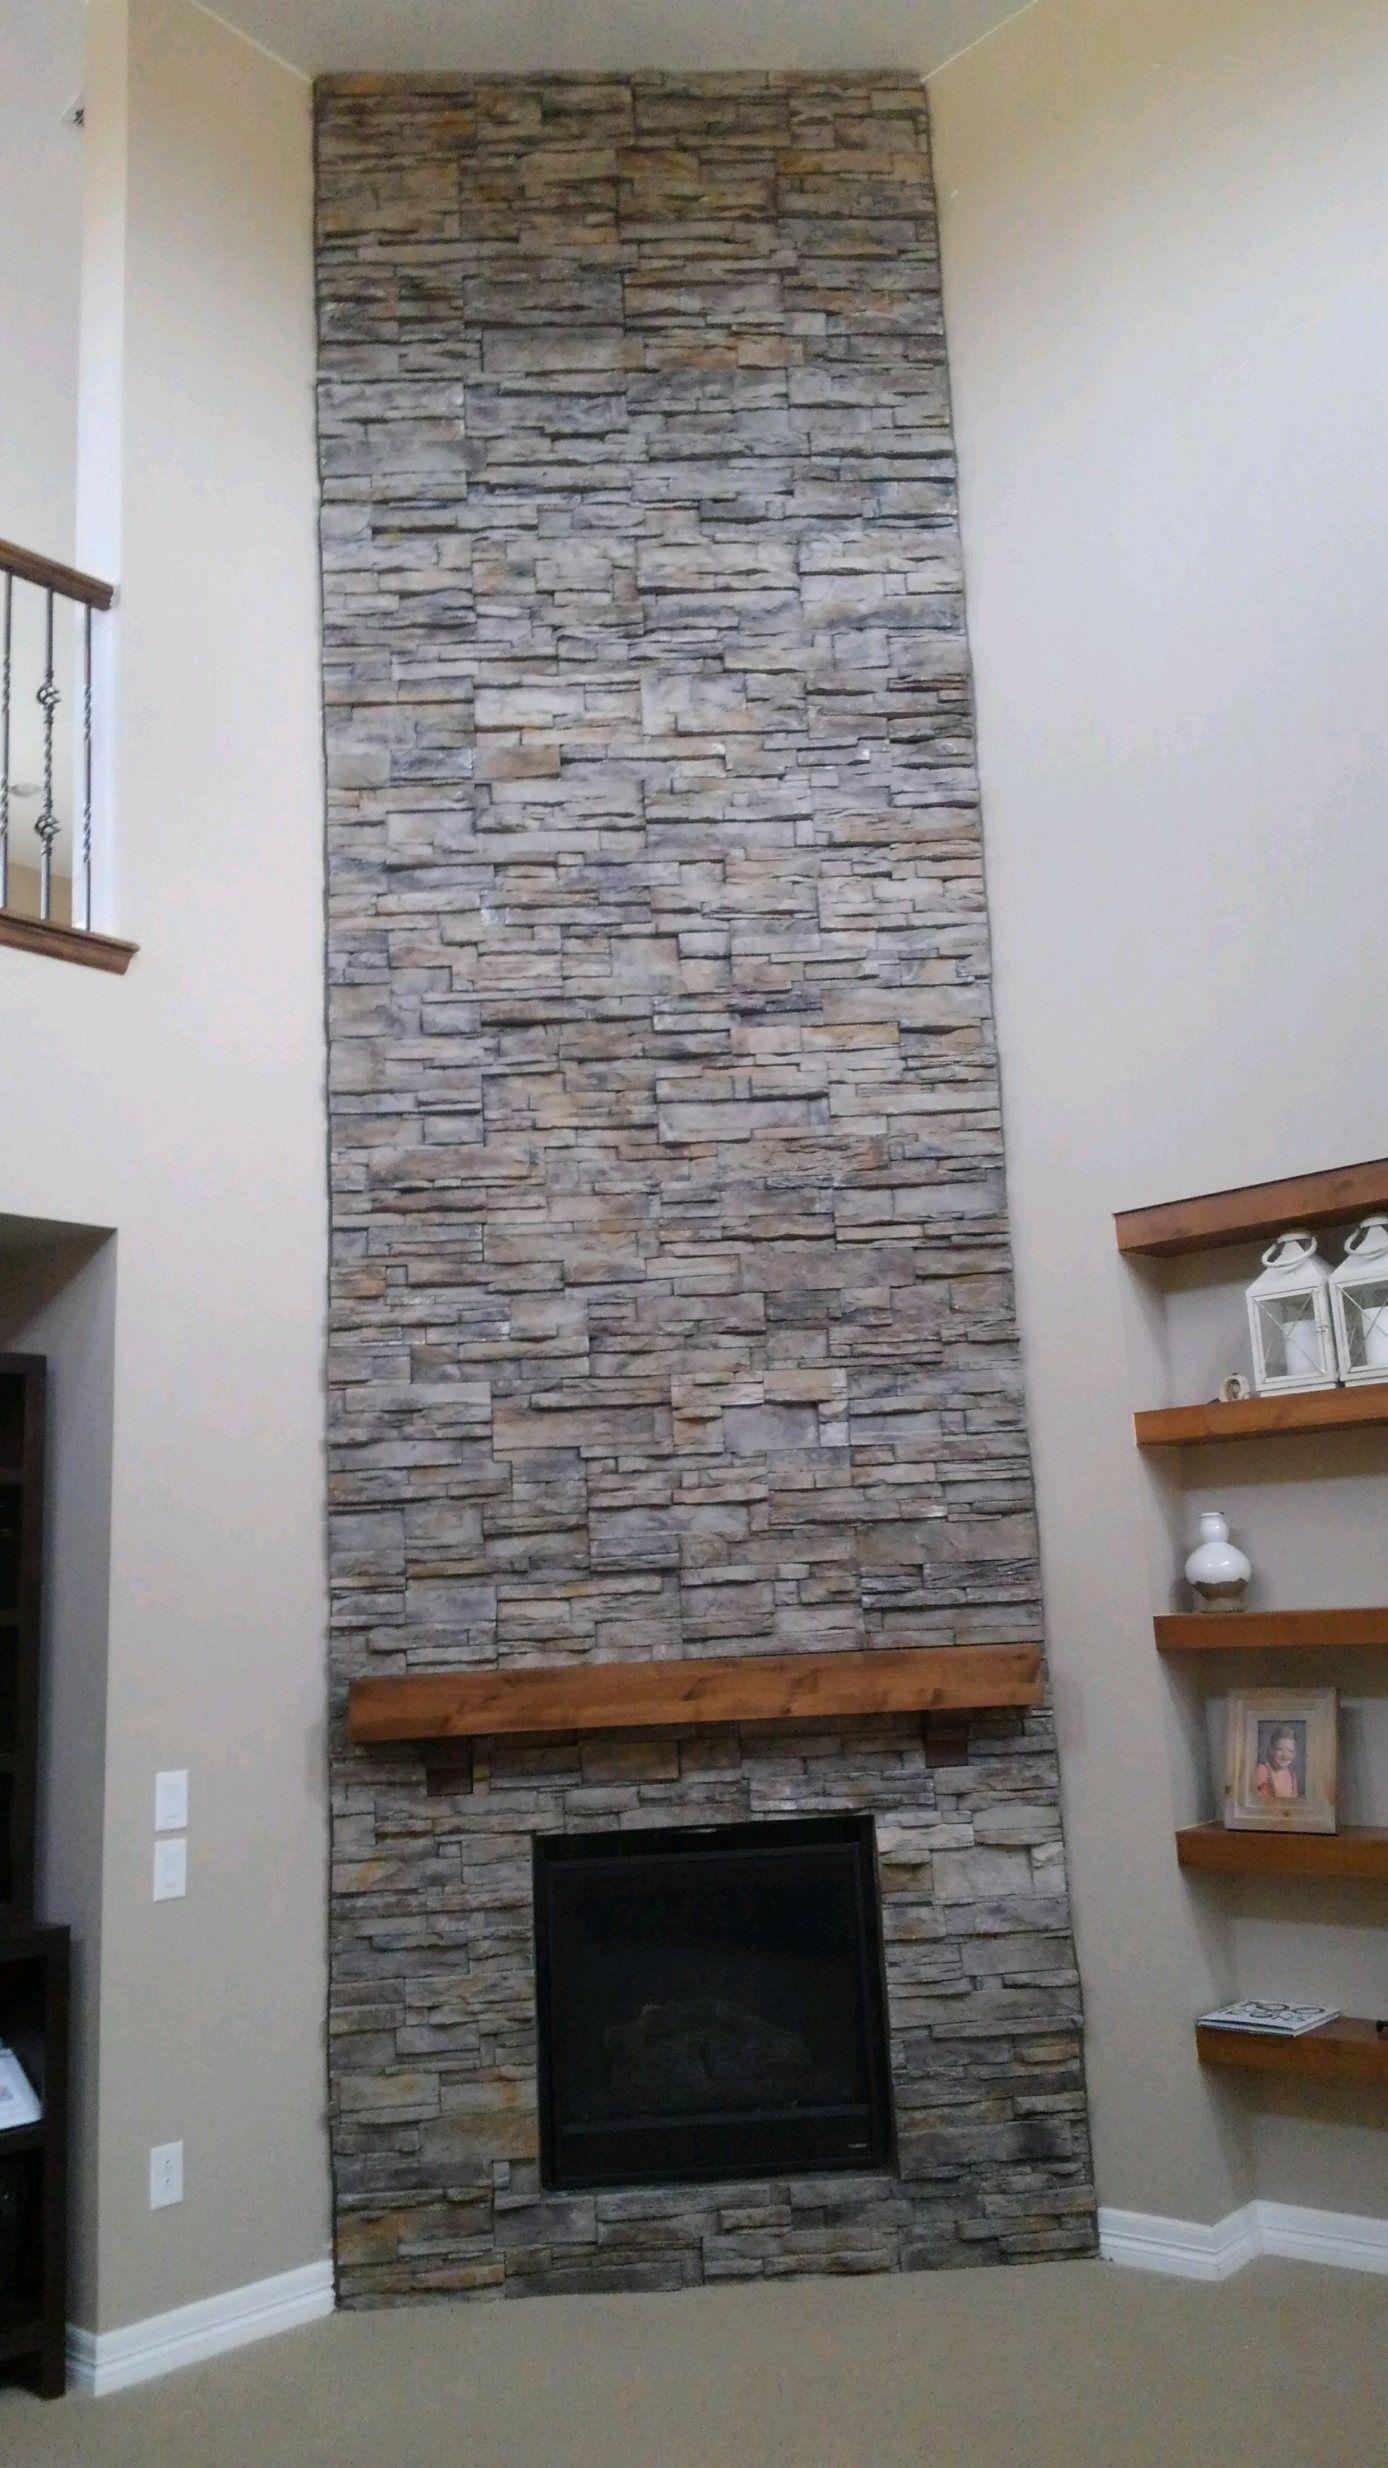 stone veneer fireplace fireplaces stone veneer fireplace stone rh pinterest com